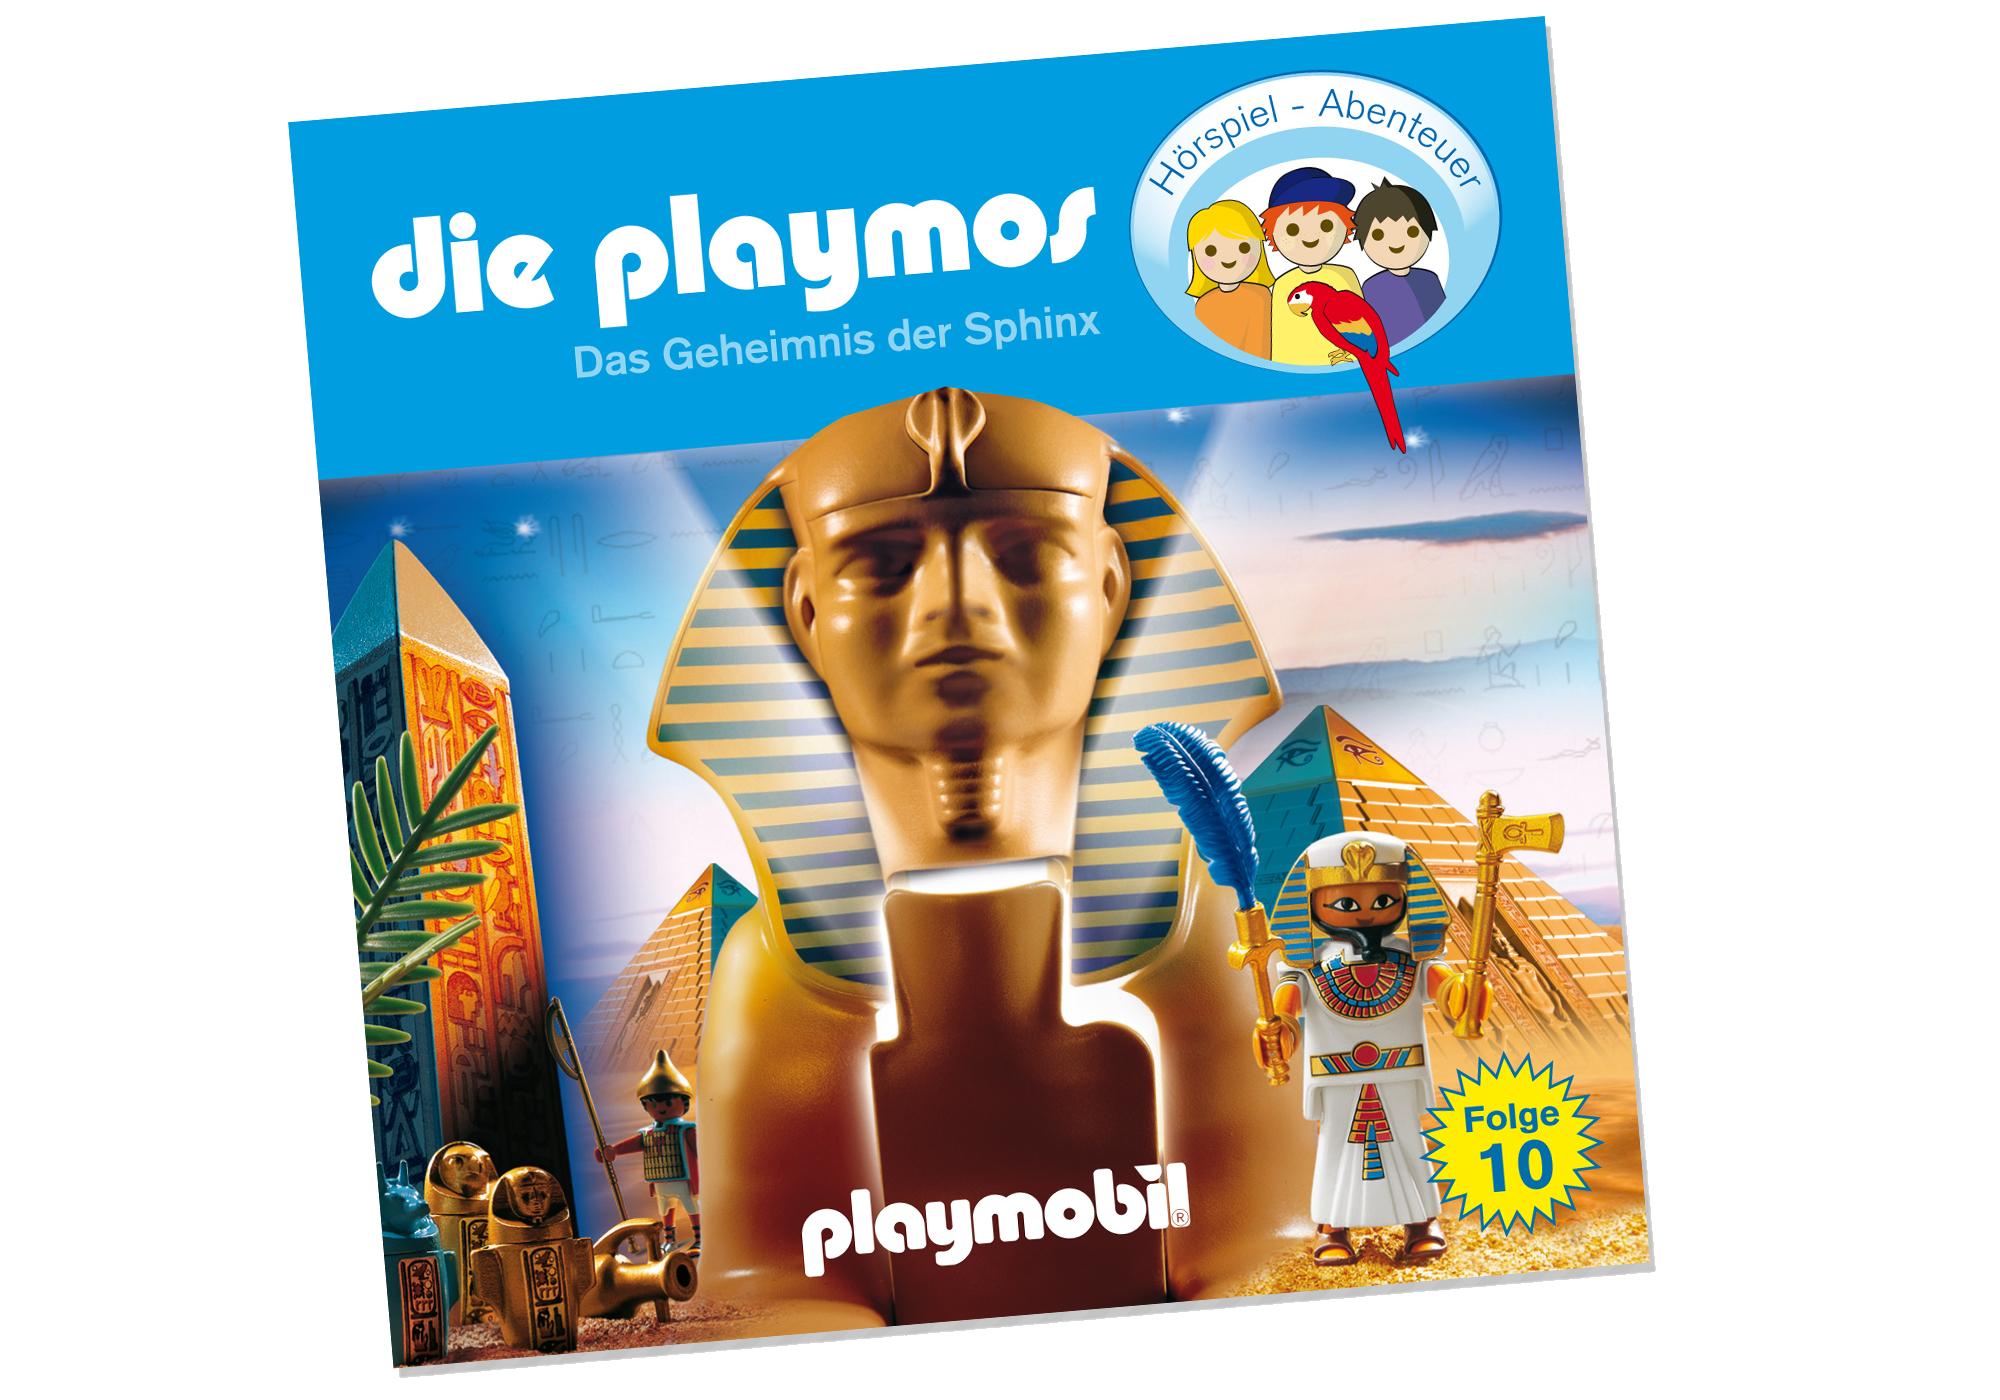 http://media.playmobil.com/i/playmobil/80188_product_detail/Die geheimnisvolle Sphinx (10) - CD